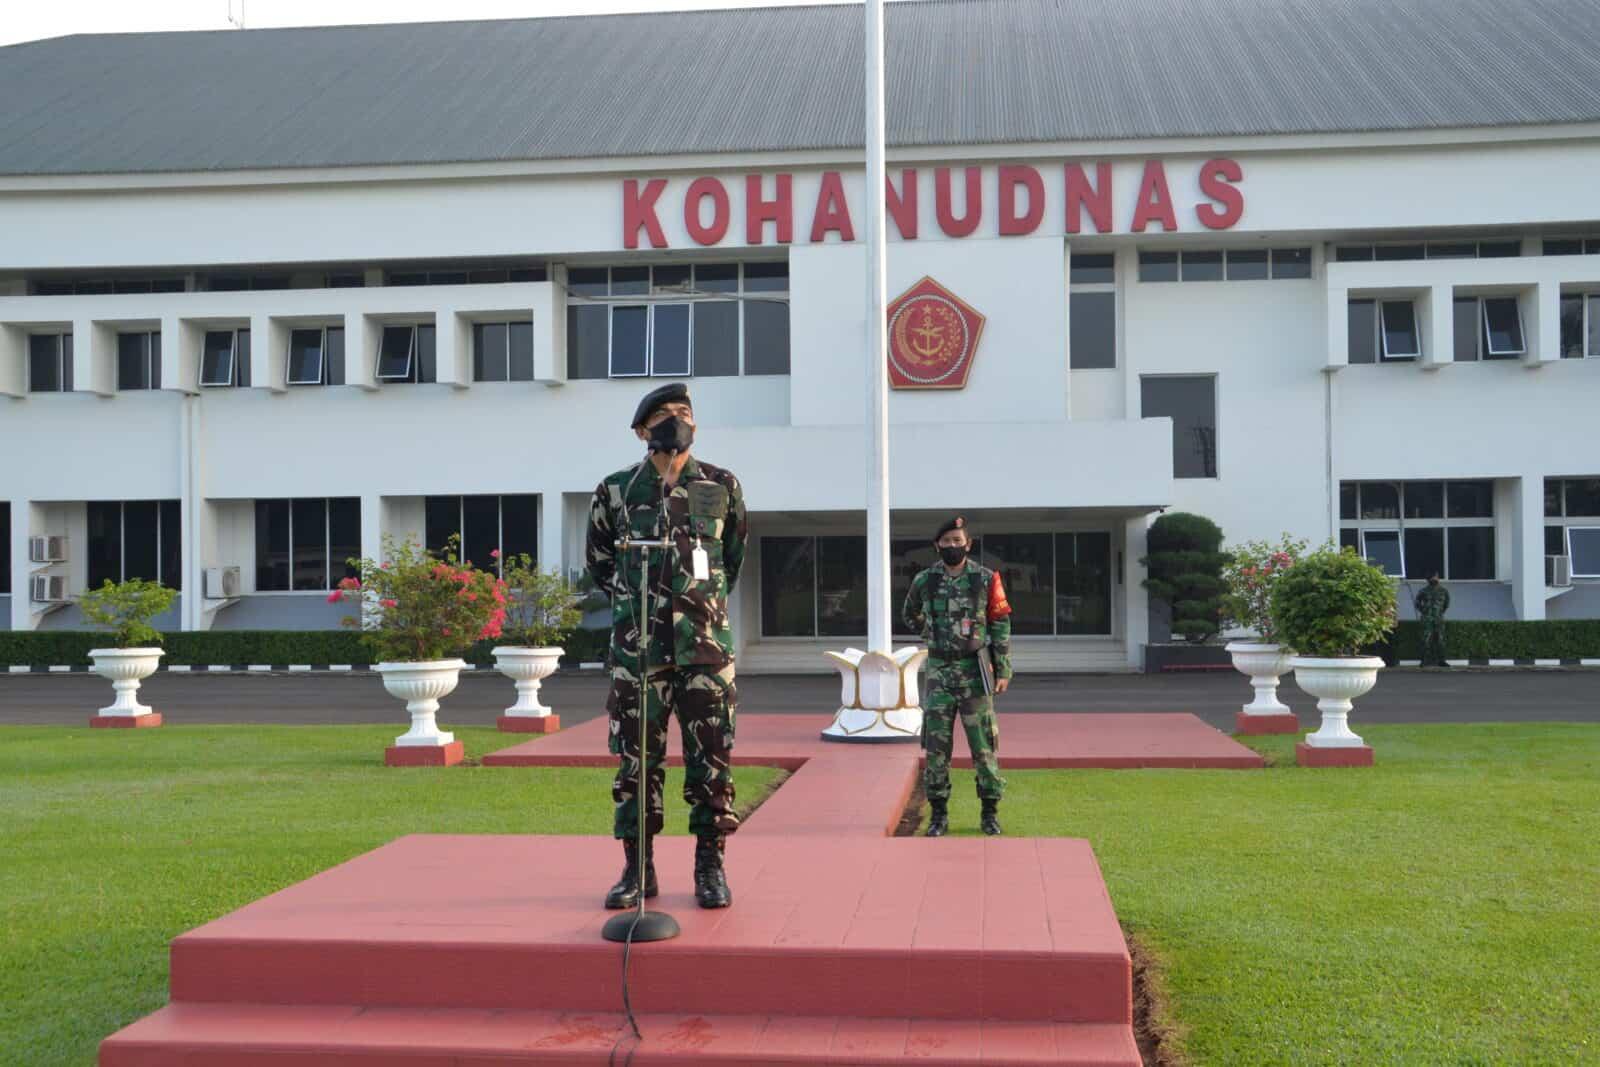 Kepala Staf Kohanudnas Pimpin Apel Khusus